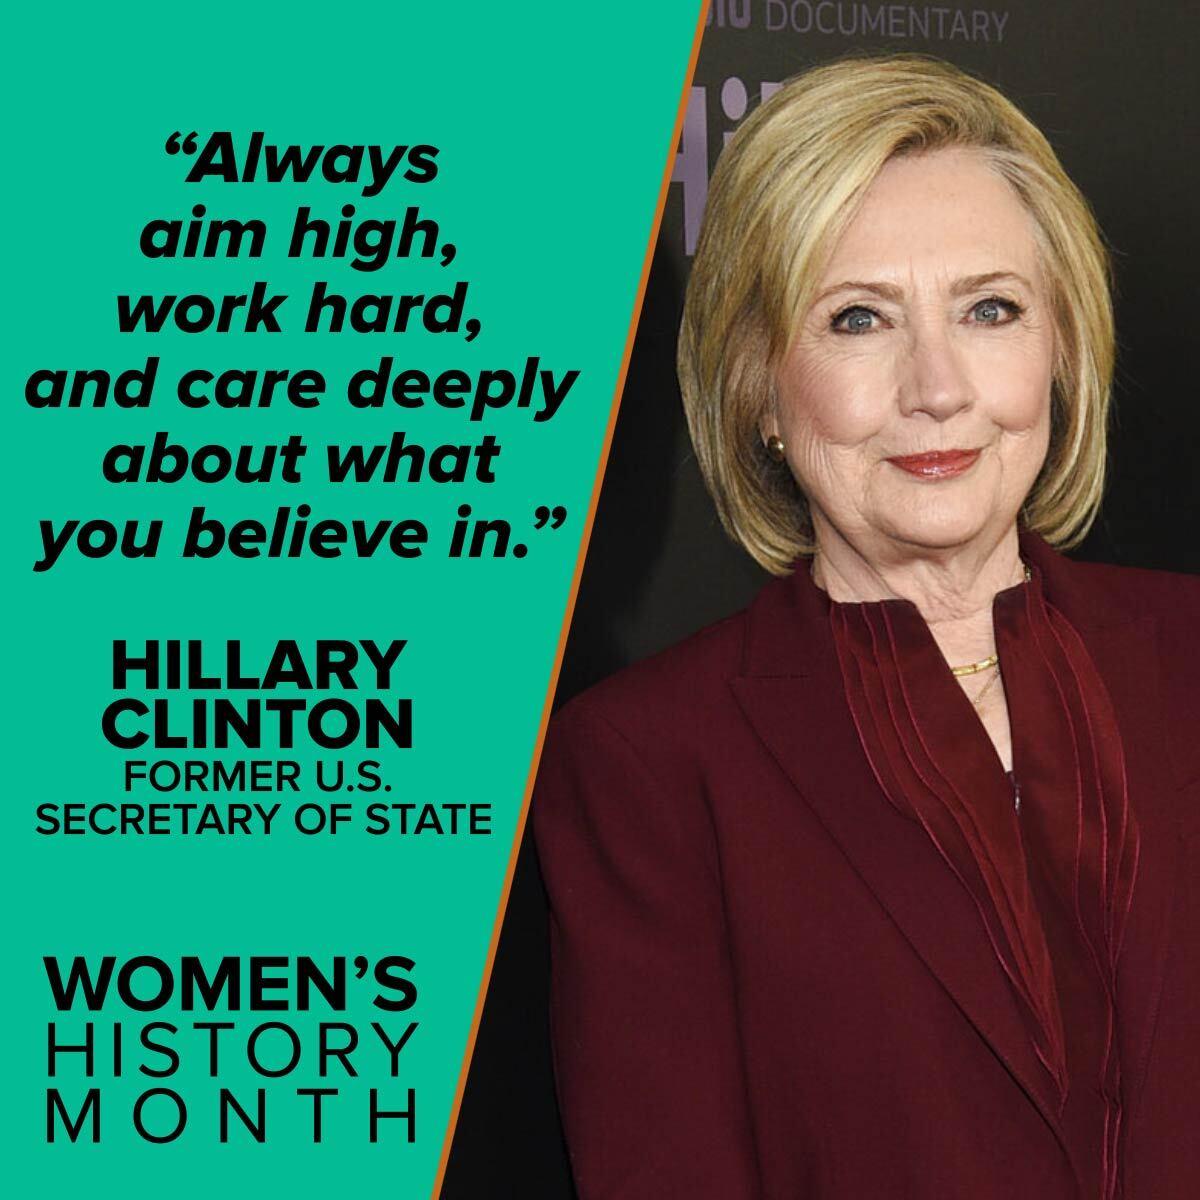 Women's History Month_Hillary Clinton .jpg